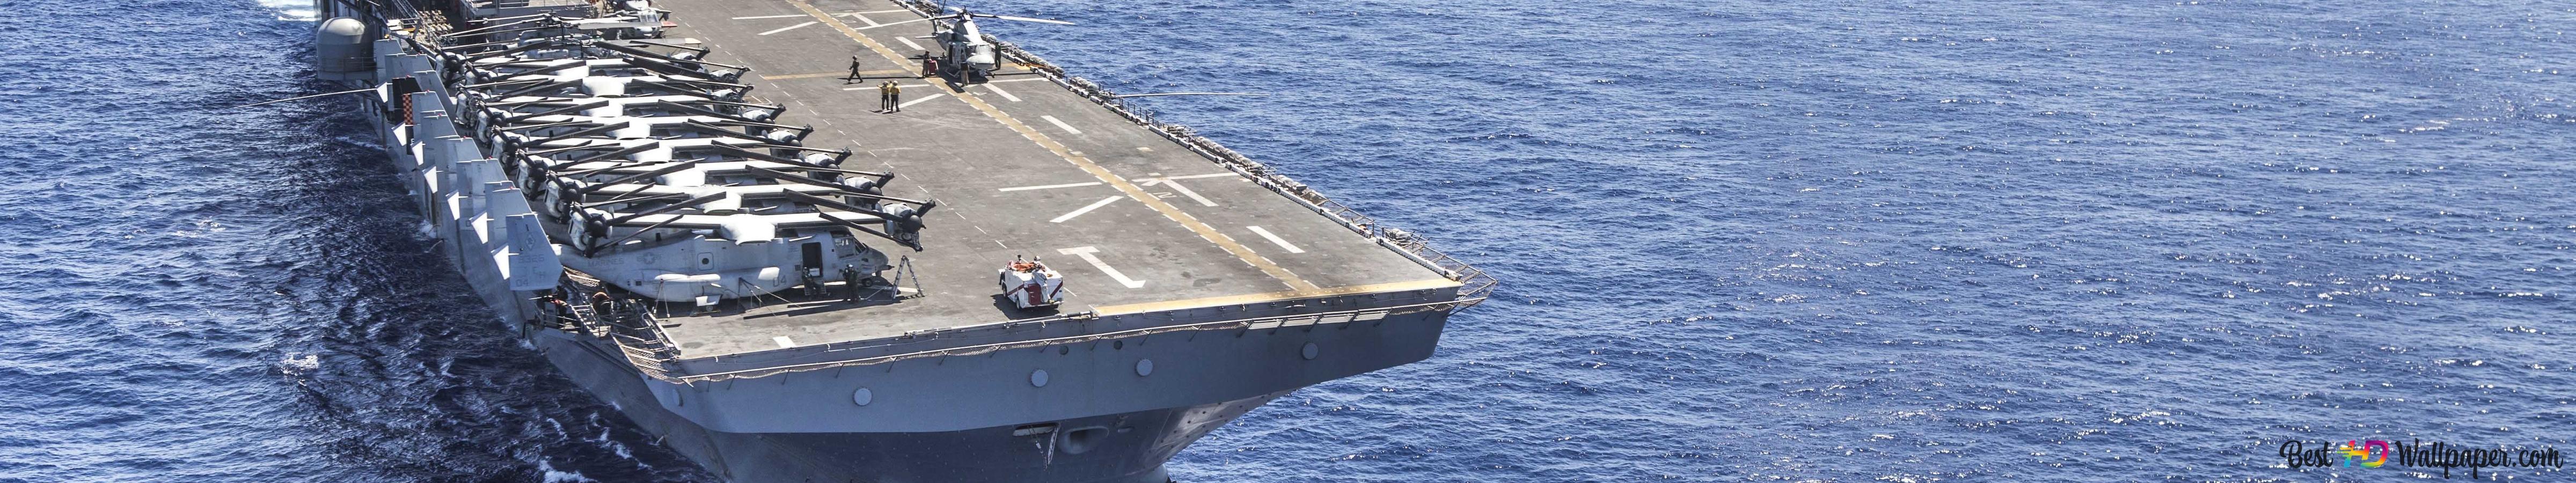 Warship Hd Wallpaper Download